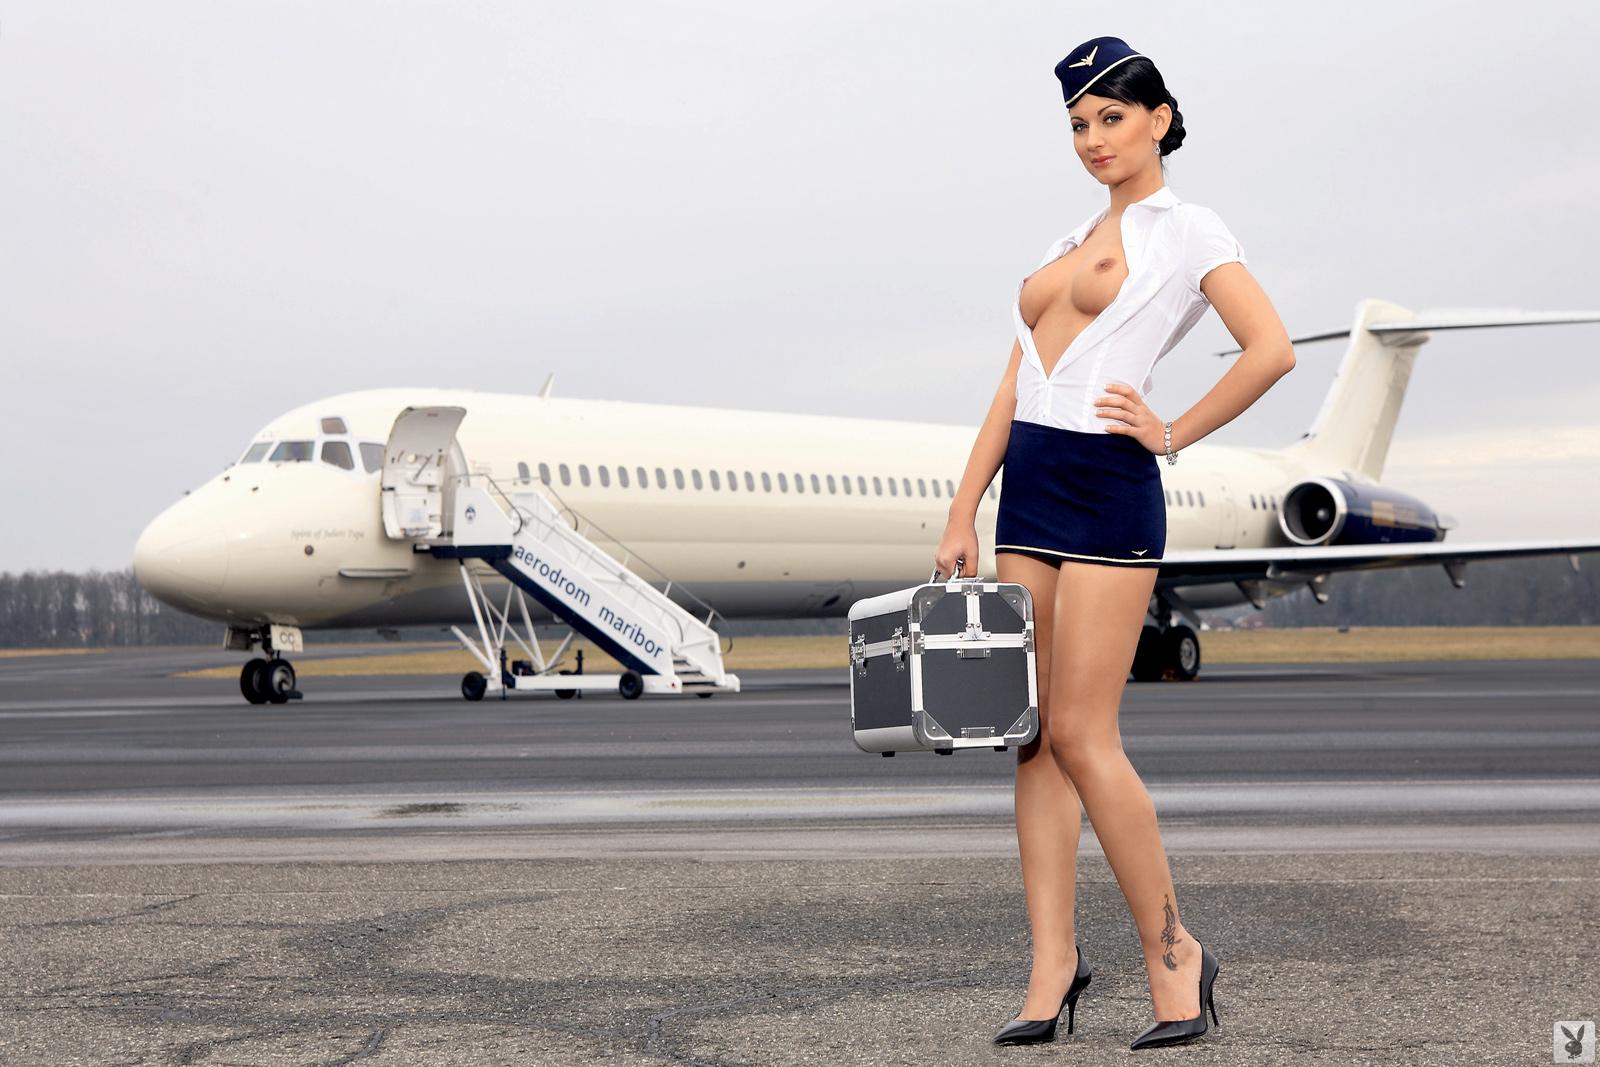 Aimee addison in her comfy undies 5